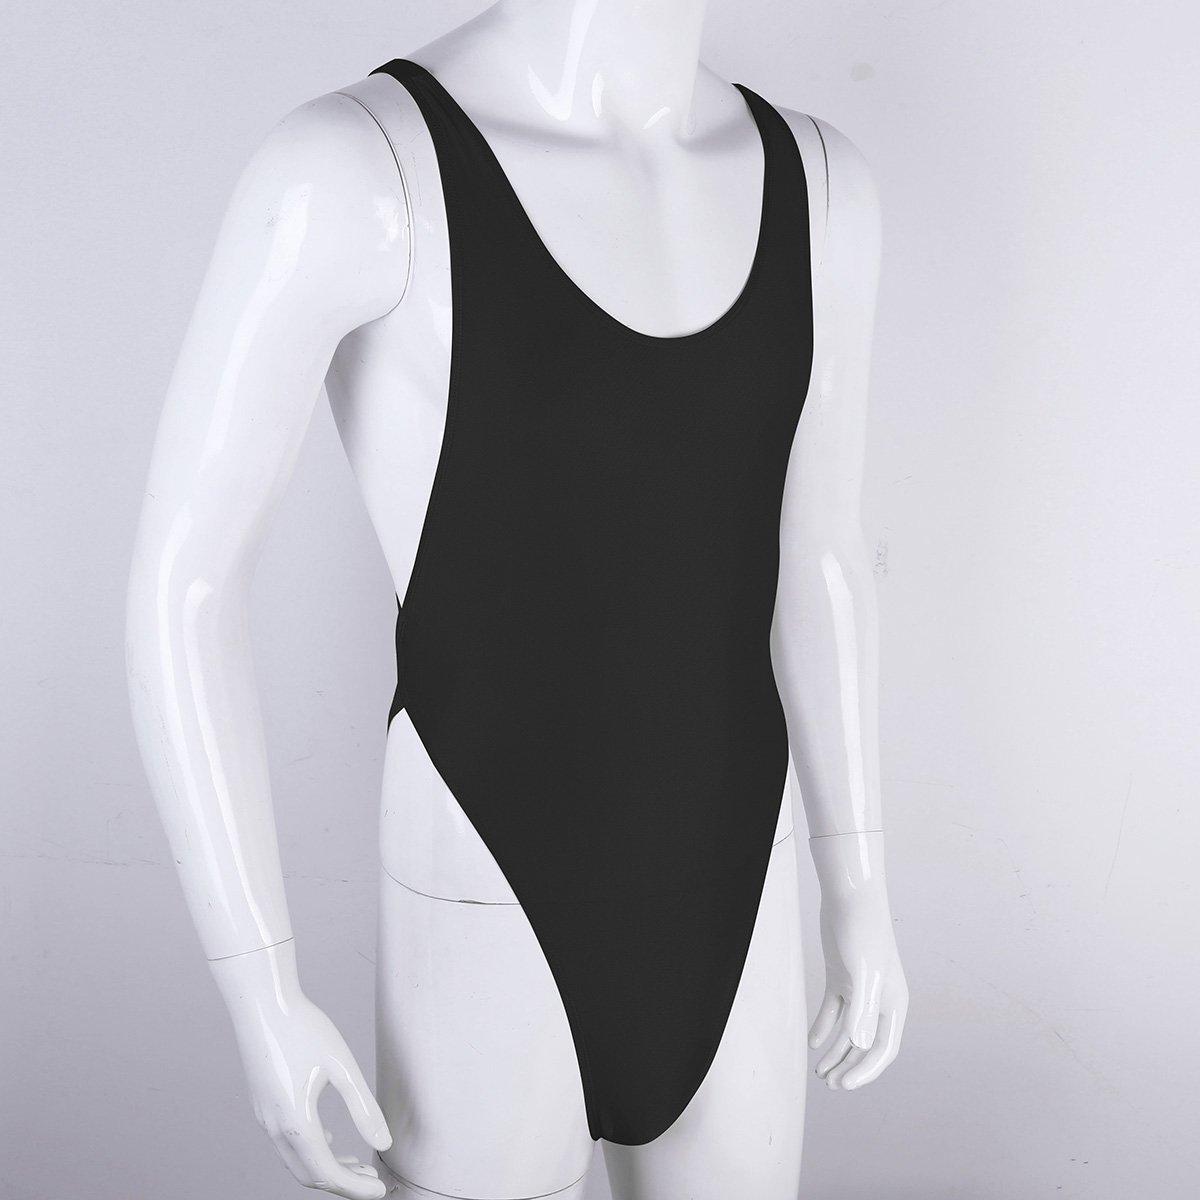 b1fc51dfb22 TiaoBug Mens One-Piece Freestyle Thong Leotard Bodysuit Jumpsuit Underwear  Sleepwear: Amazon.co.uk: Clothing